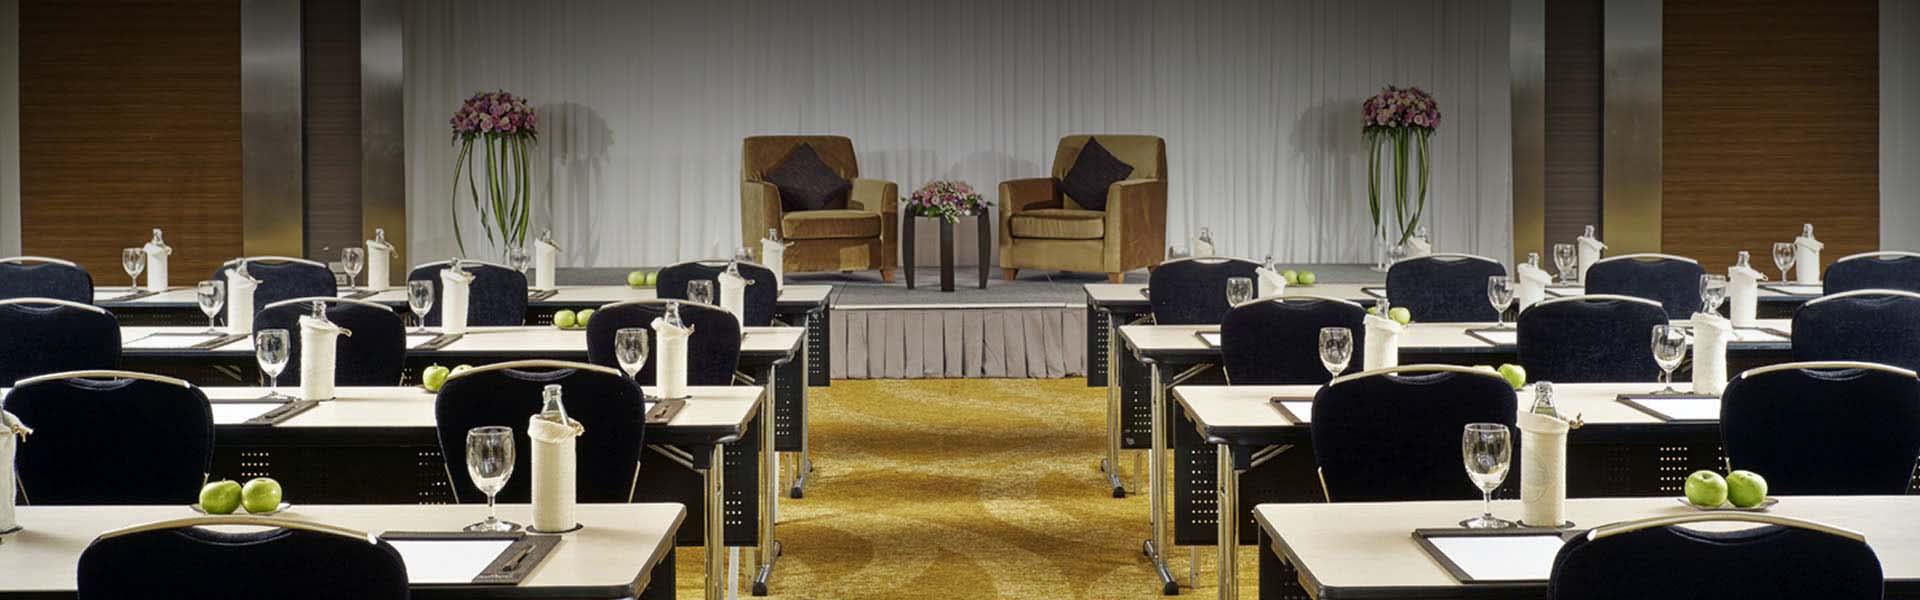 Meeting Room in Bangkok | Meeting Rooms at Anantara Sathorn